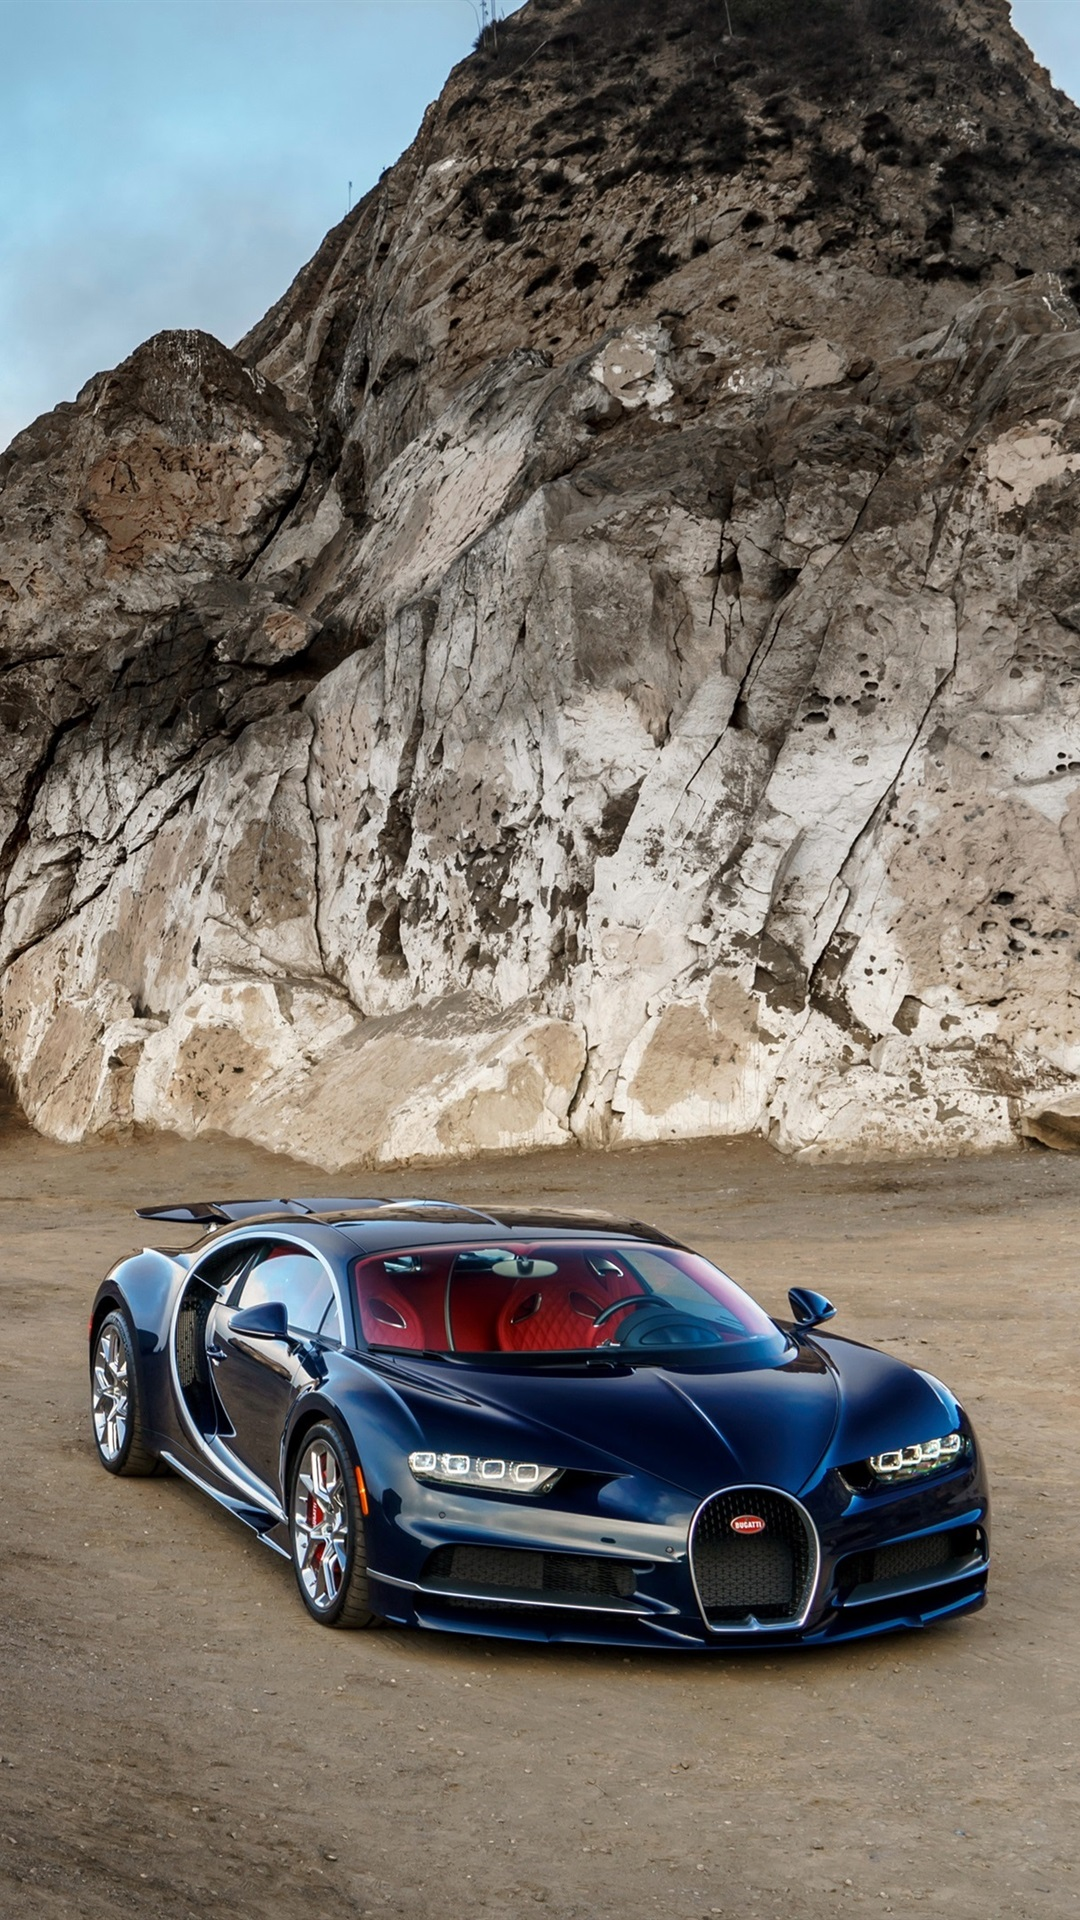 Bugatti Chiron Blue Luxury Car North America Coast